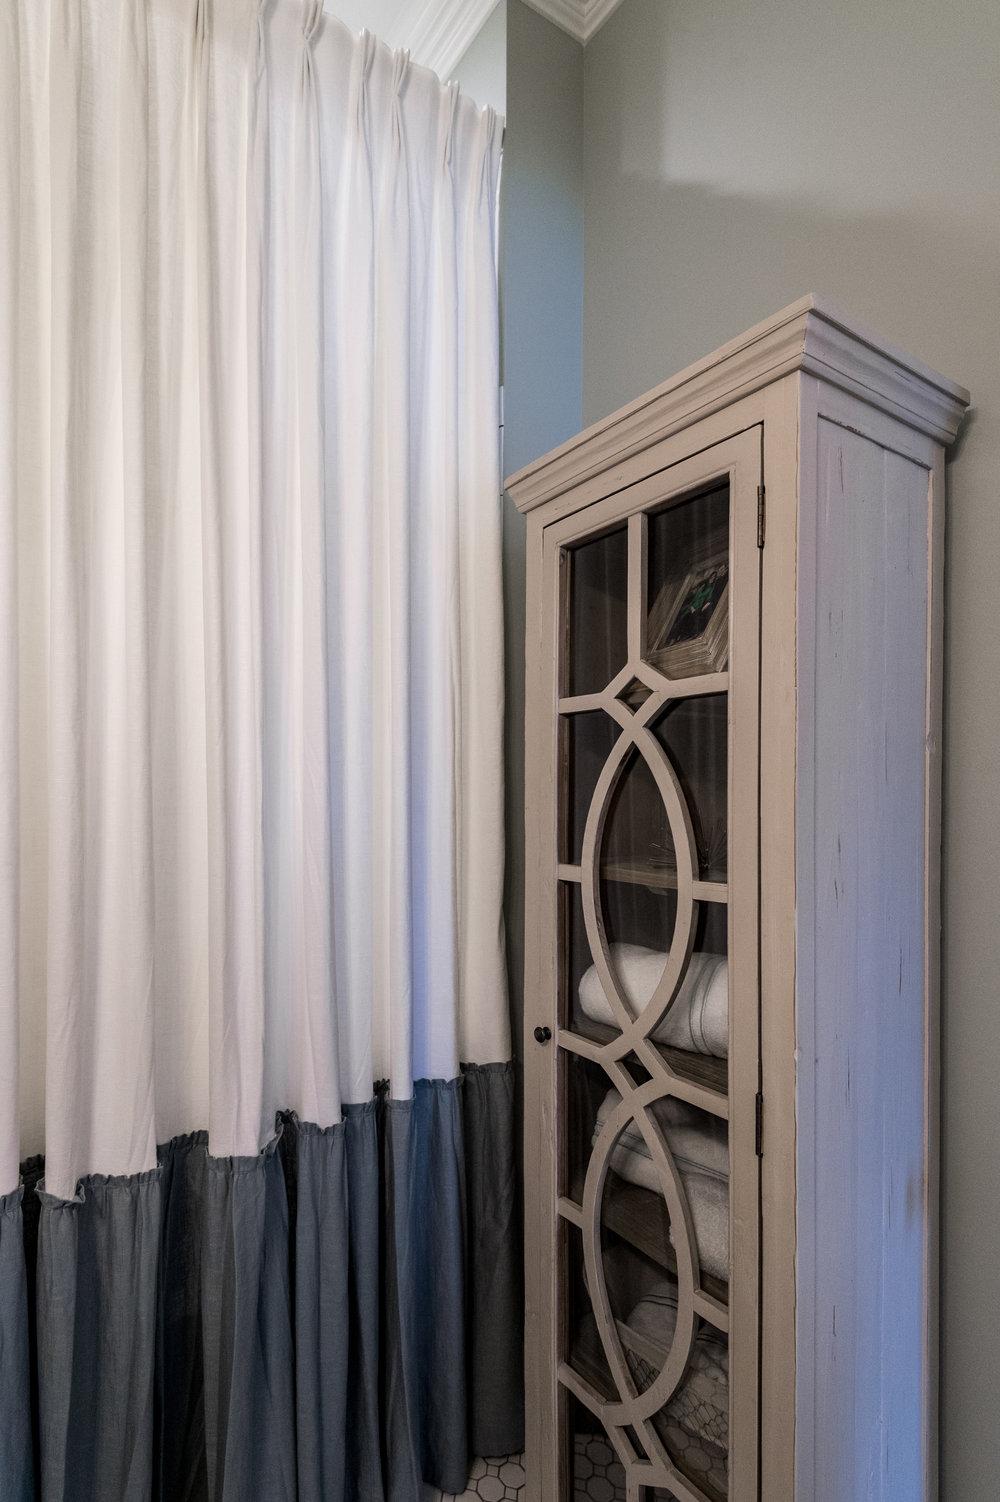 KHB Interiors details new orleans interior designer decorator old metairie details custom shower curtain.jpg